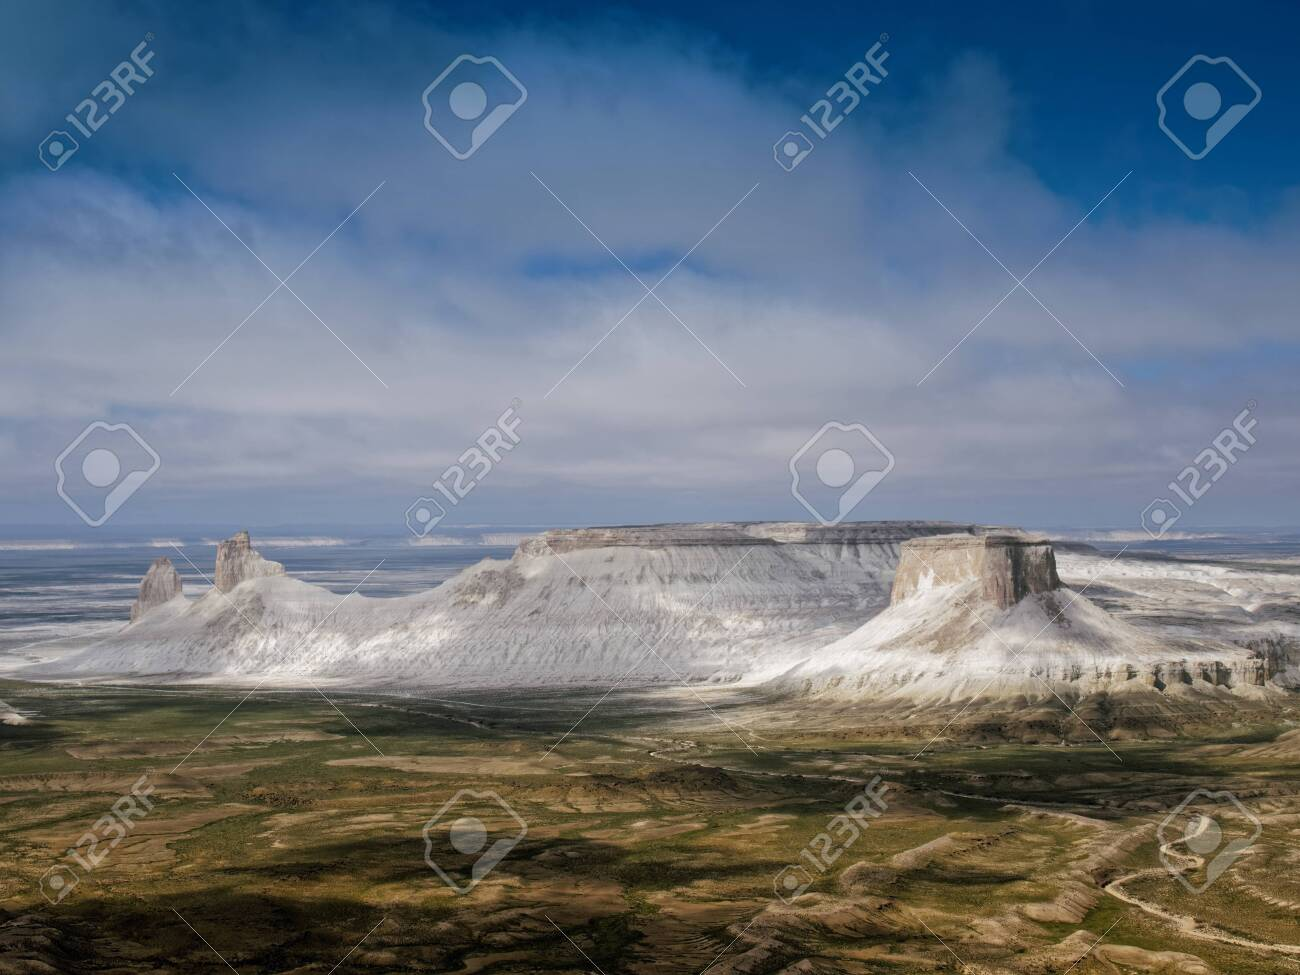 Chalk cliffs and ledges of the plateau Aktolagai. Plateau Aktolagai, Kazakhstan 2019.Expedition site Turister.ru. - 142252651